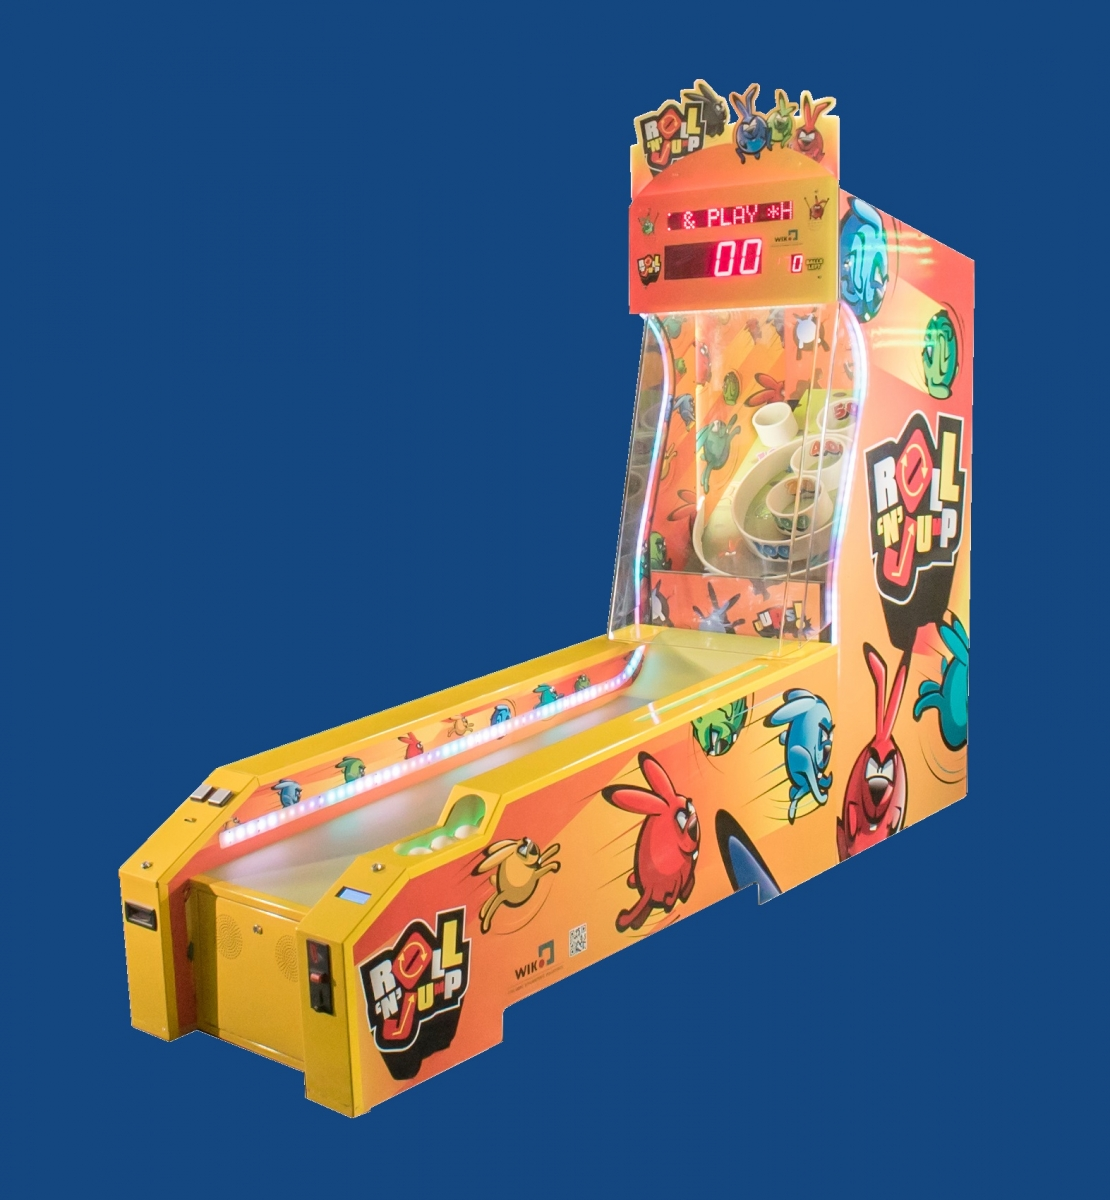 Skee Ball Machine Rental San Francisco Bay Area